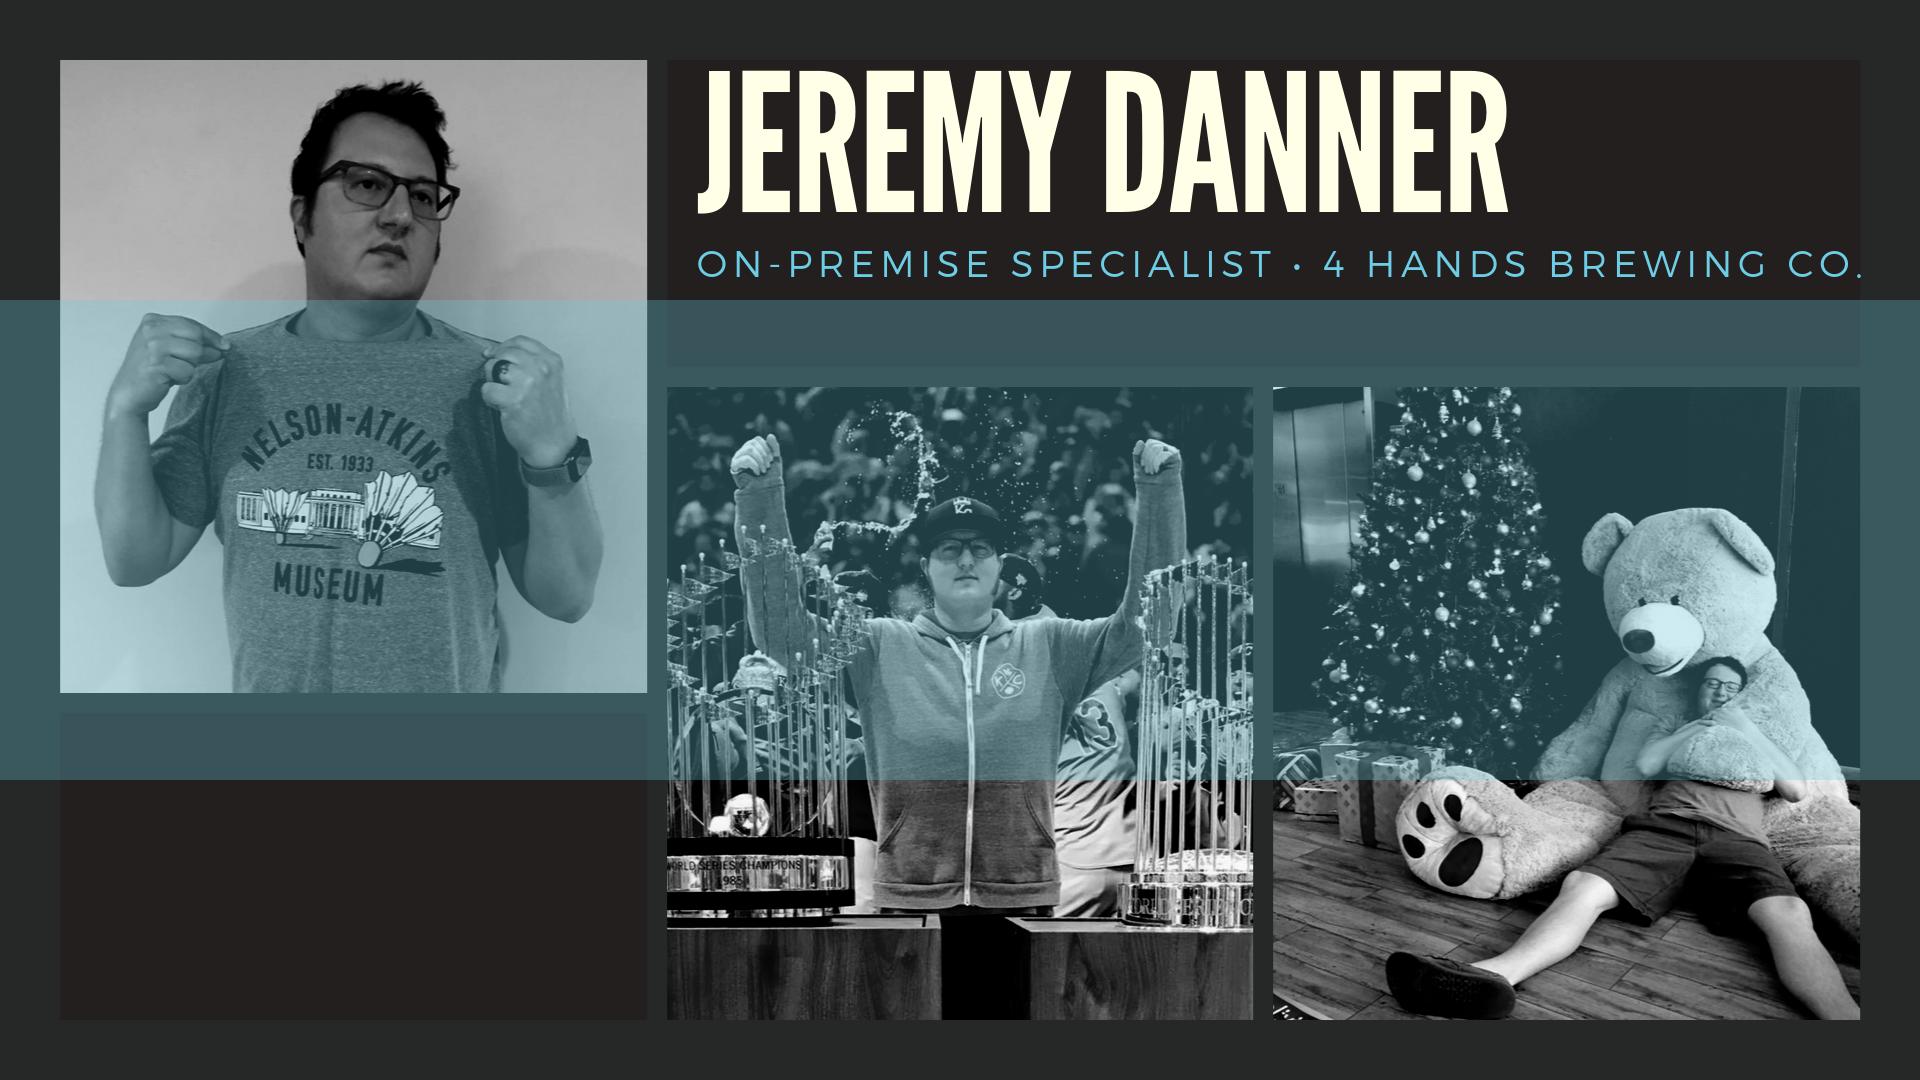 JeremyDanner